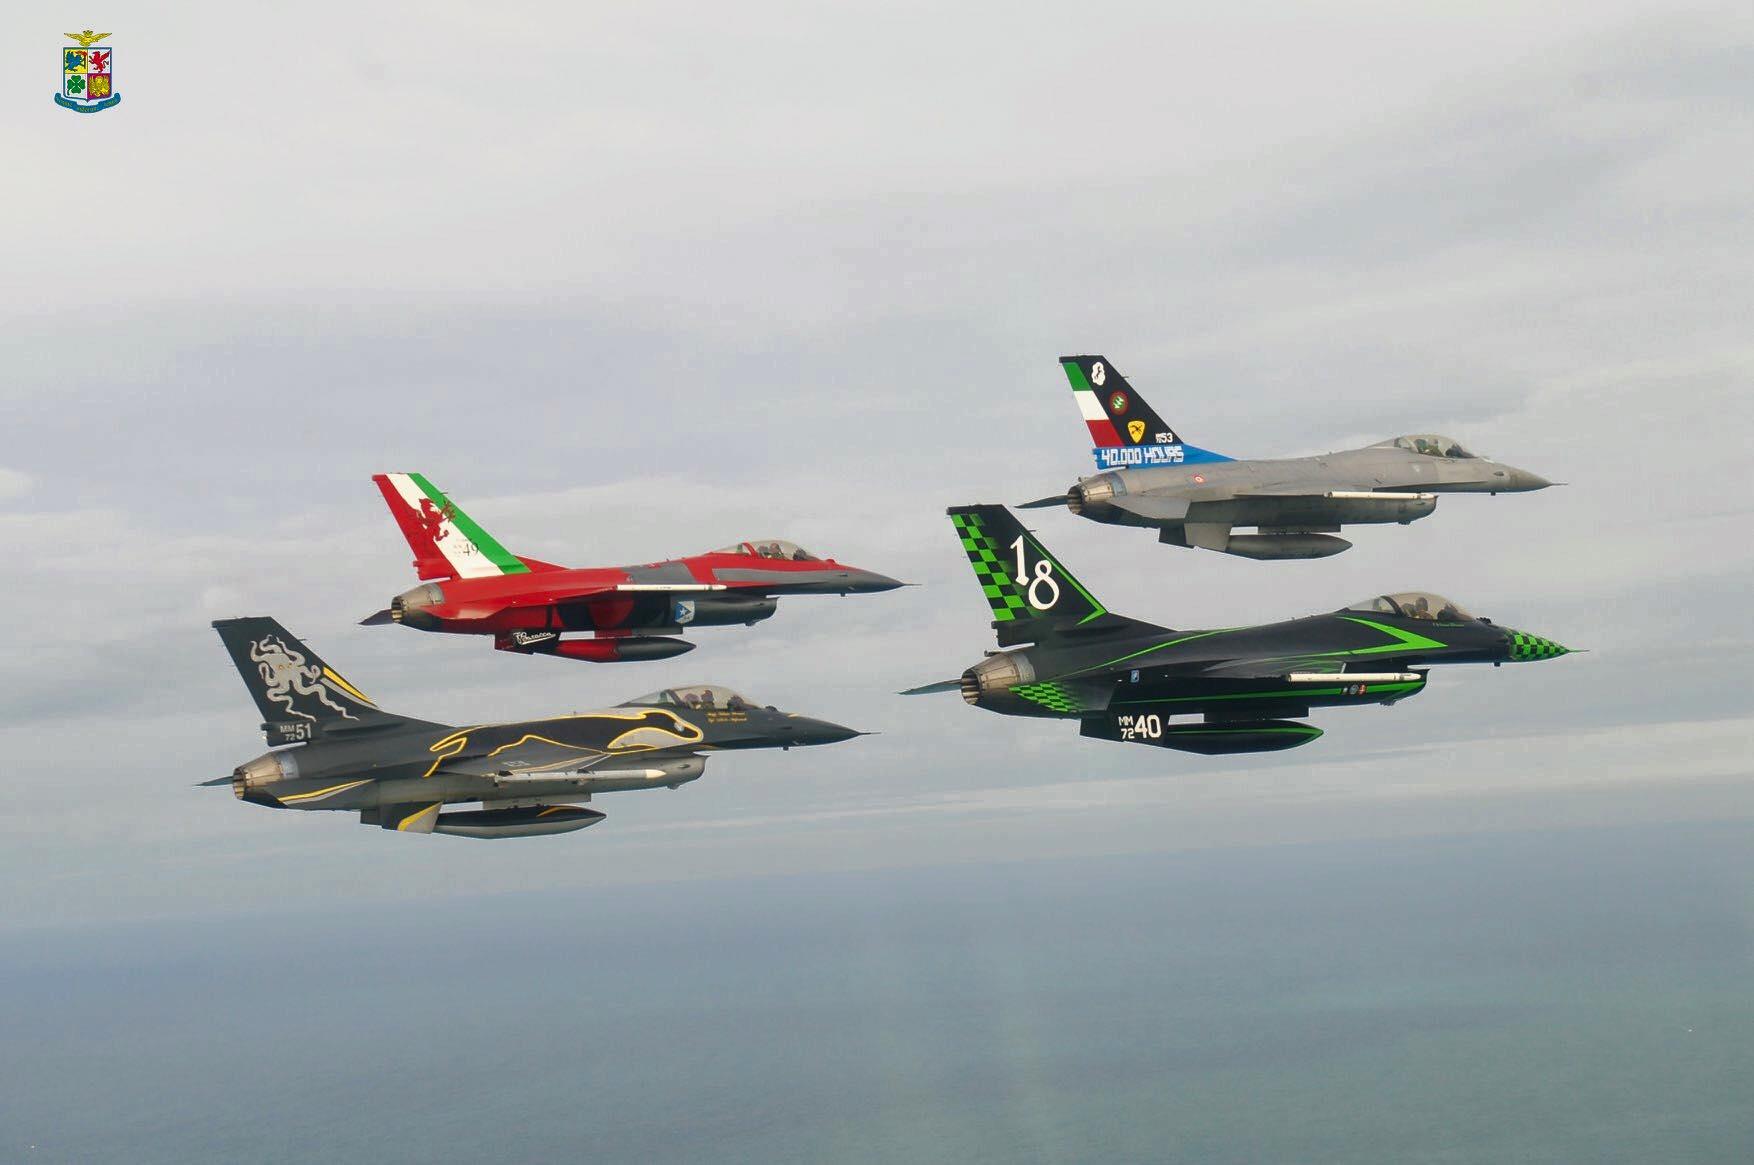 Italian F-16 special edition | Aircraft of World War II ...